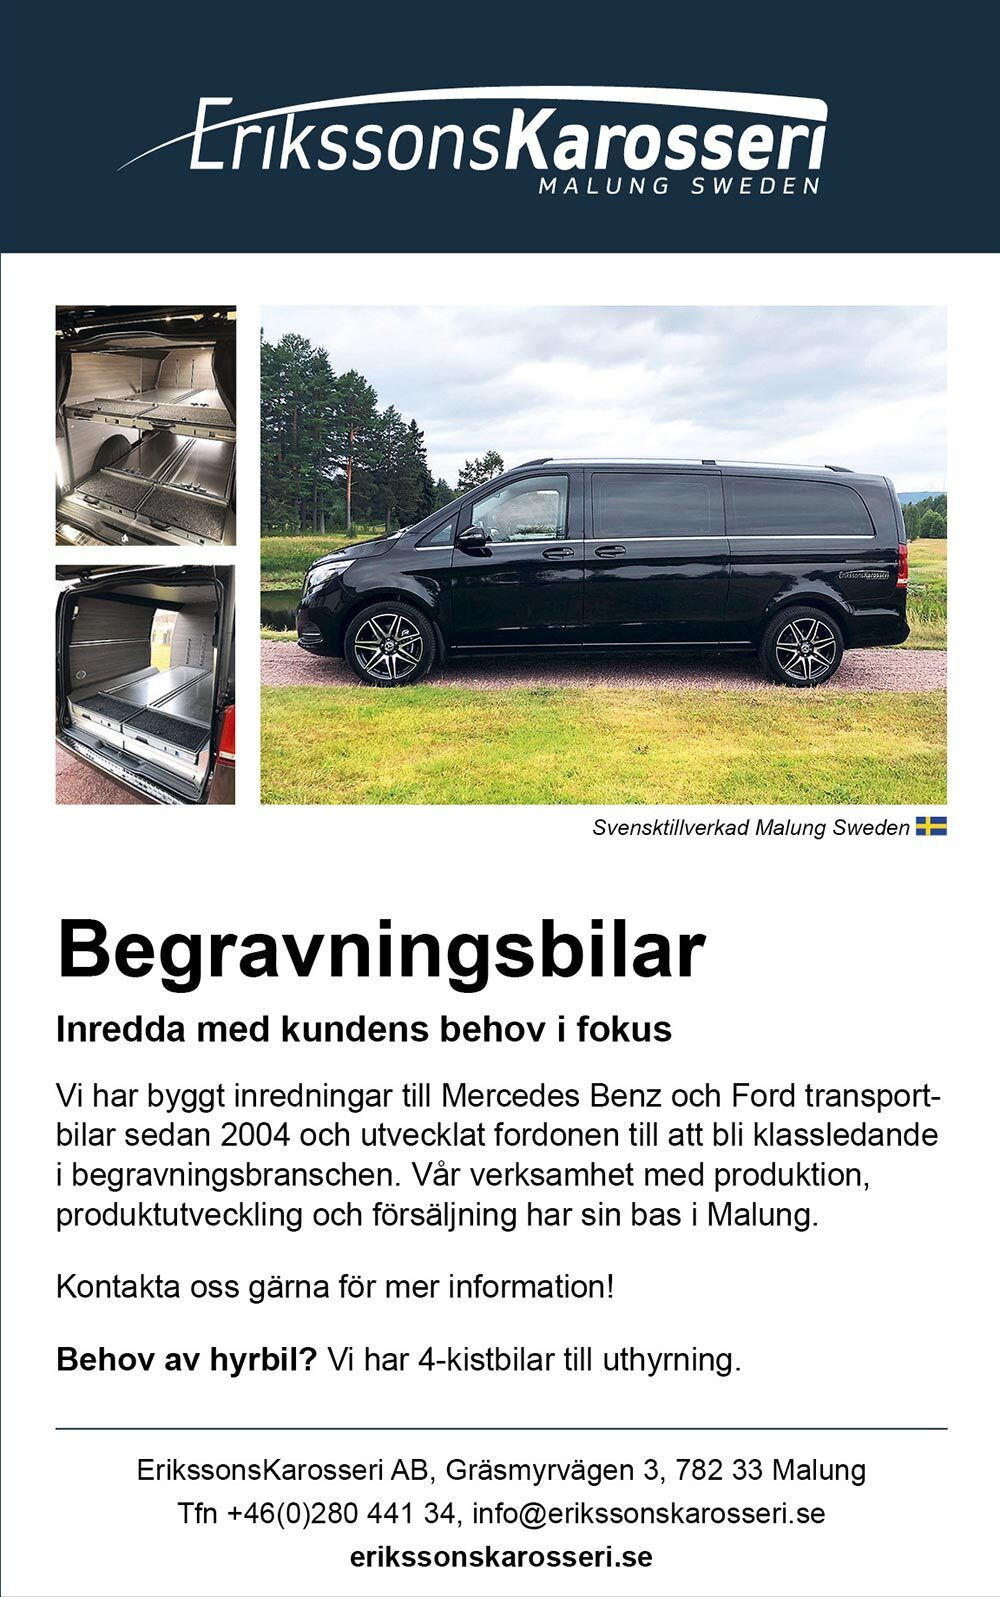 Erikssons_Karosseri_2021.jpg